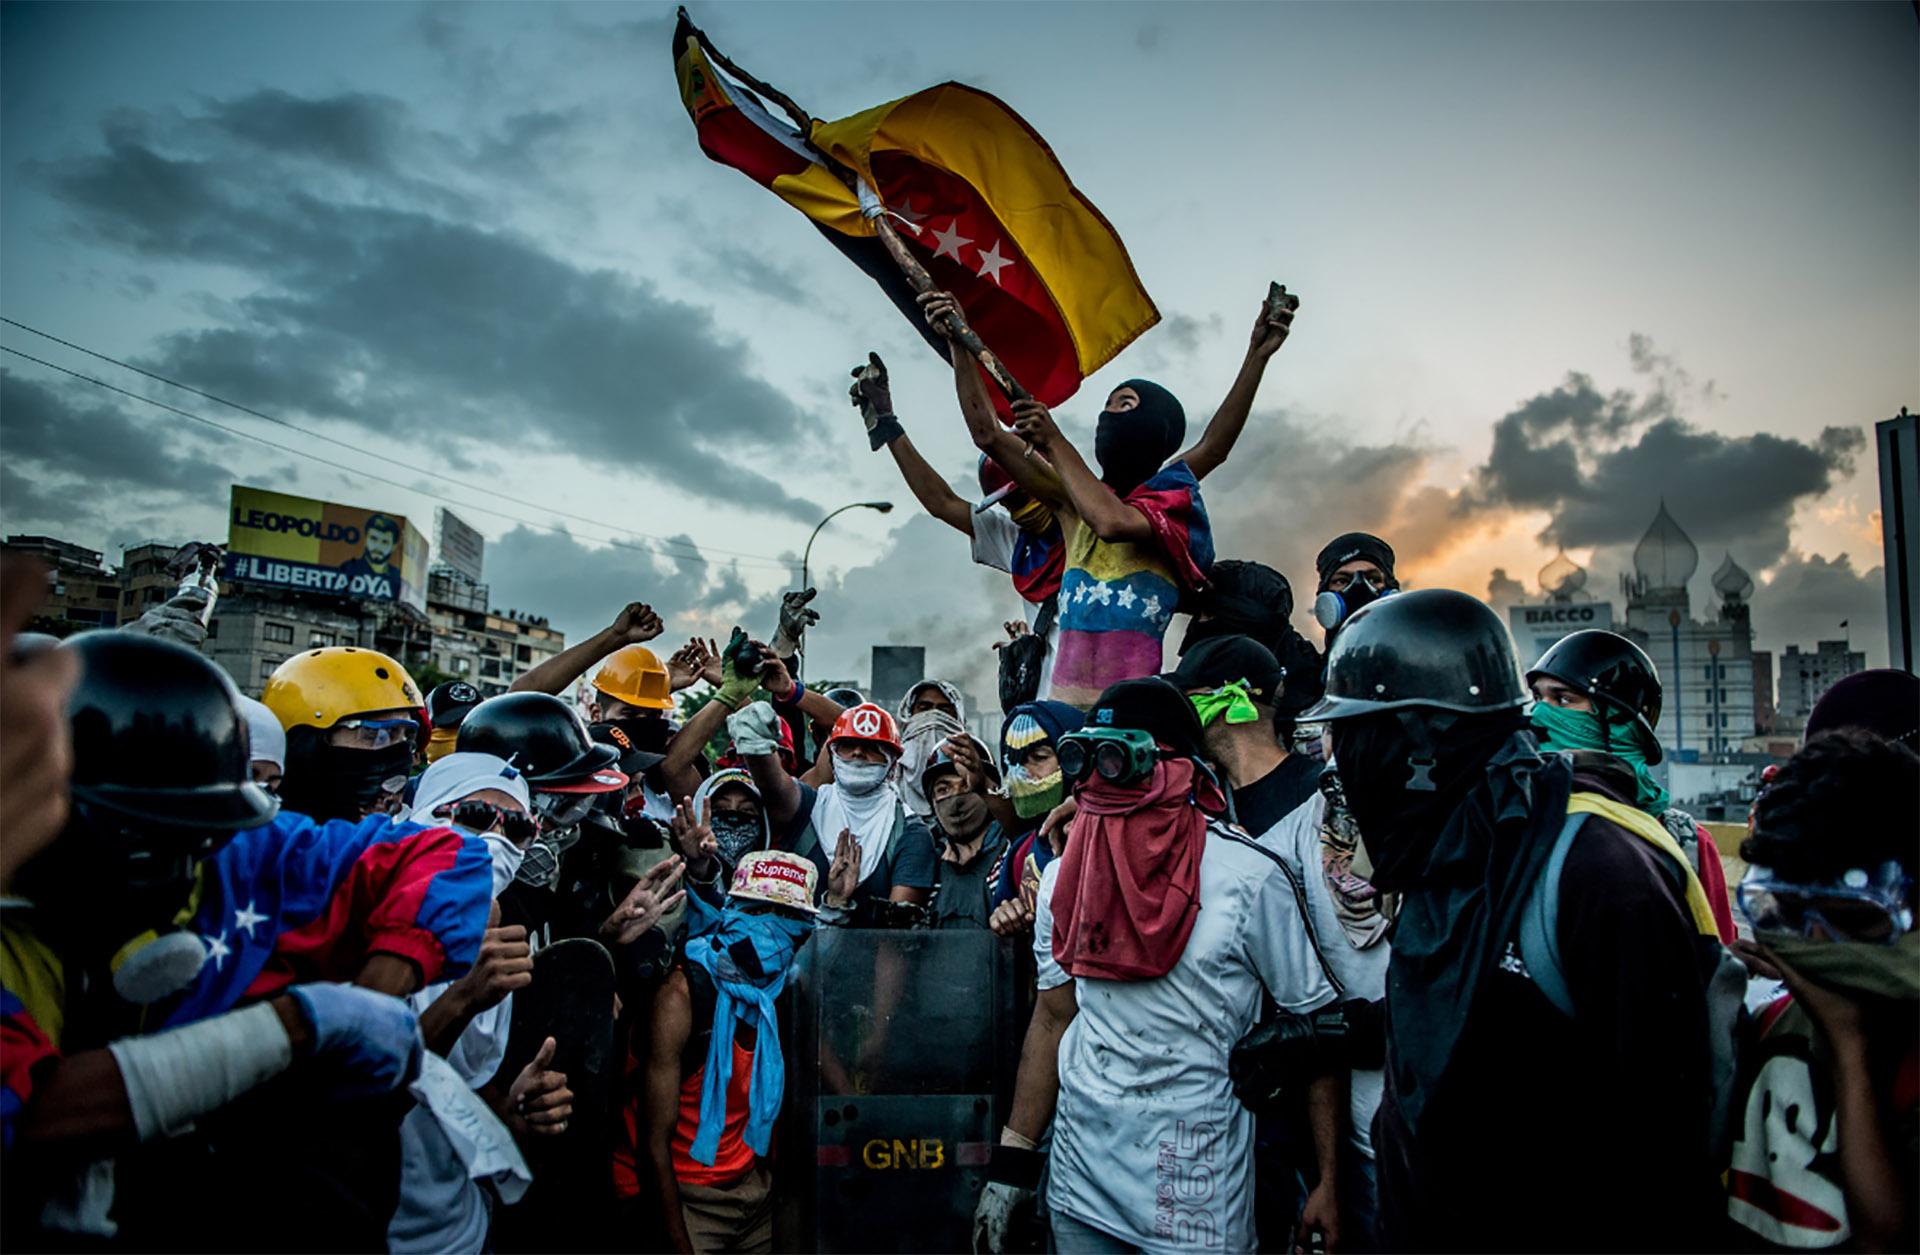 Manifestantes opositores en Venezuela (Meridith Kohut for The New York Times)